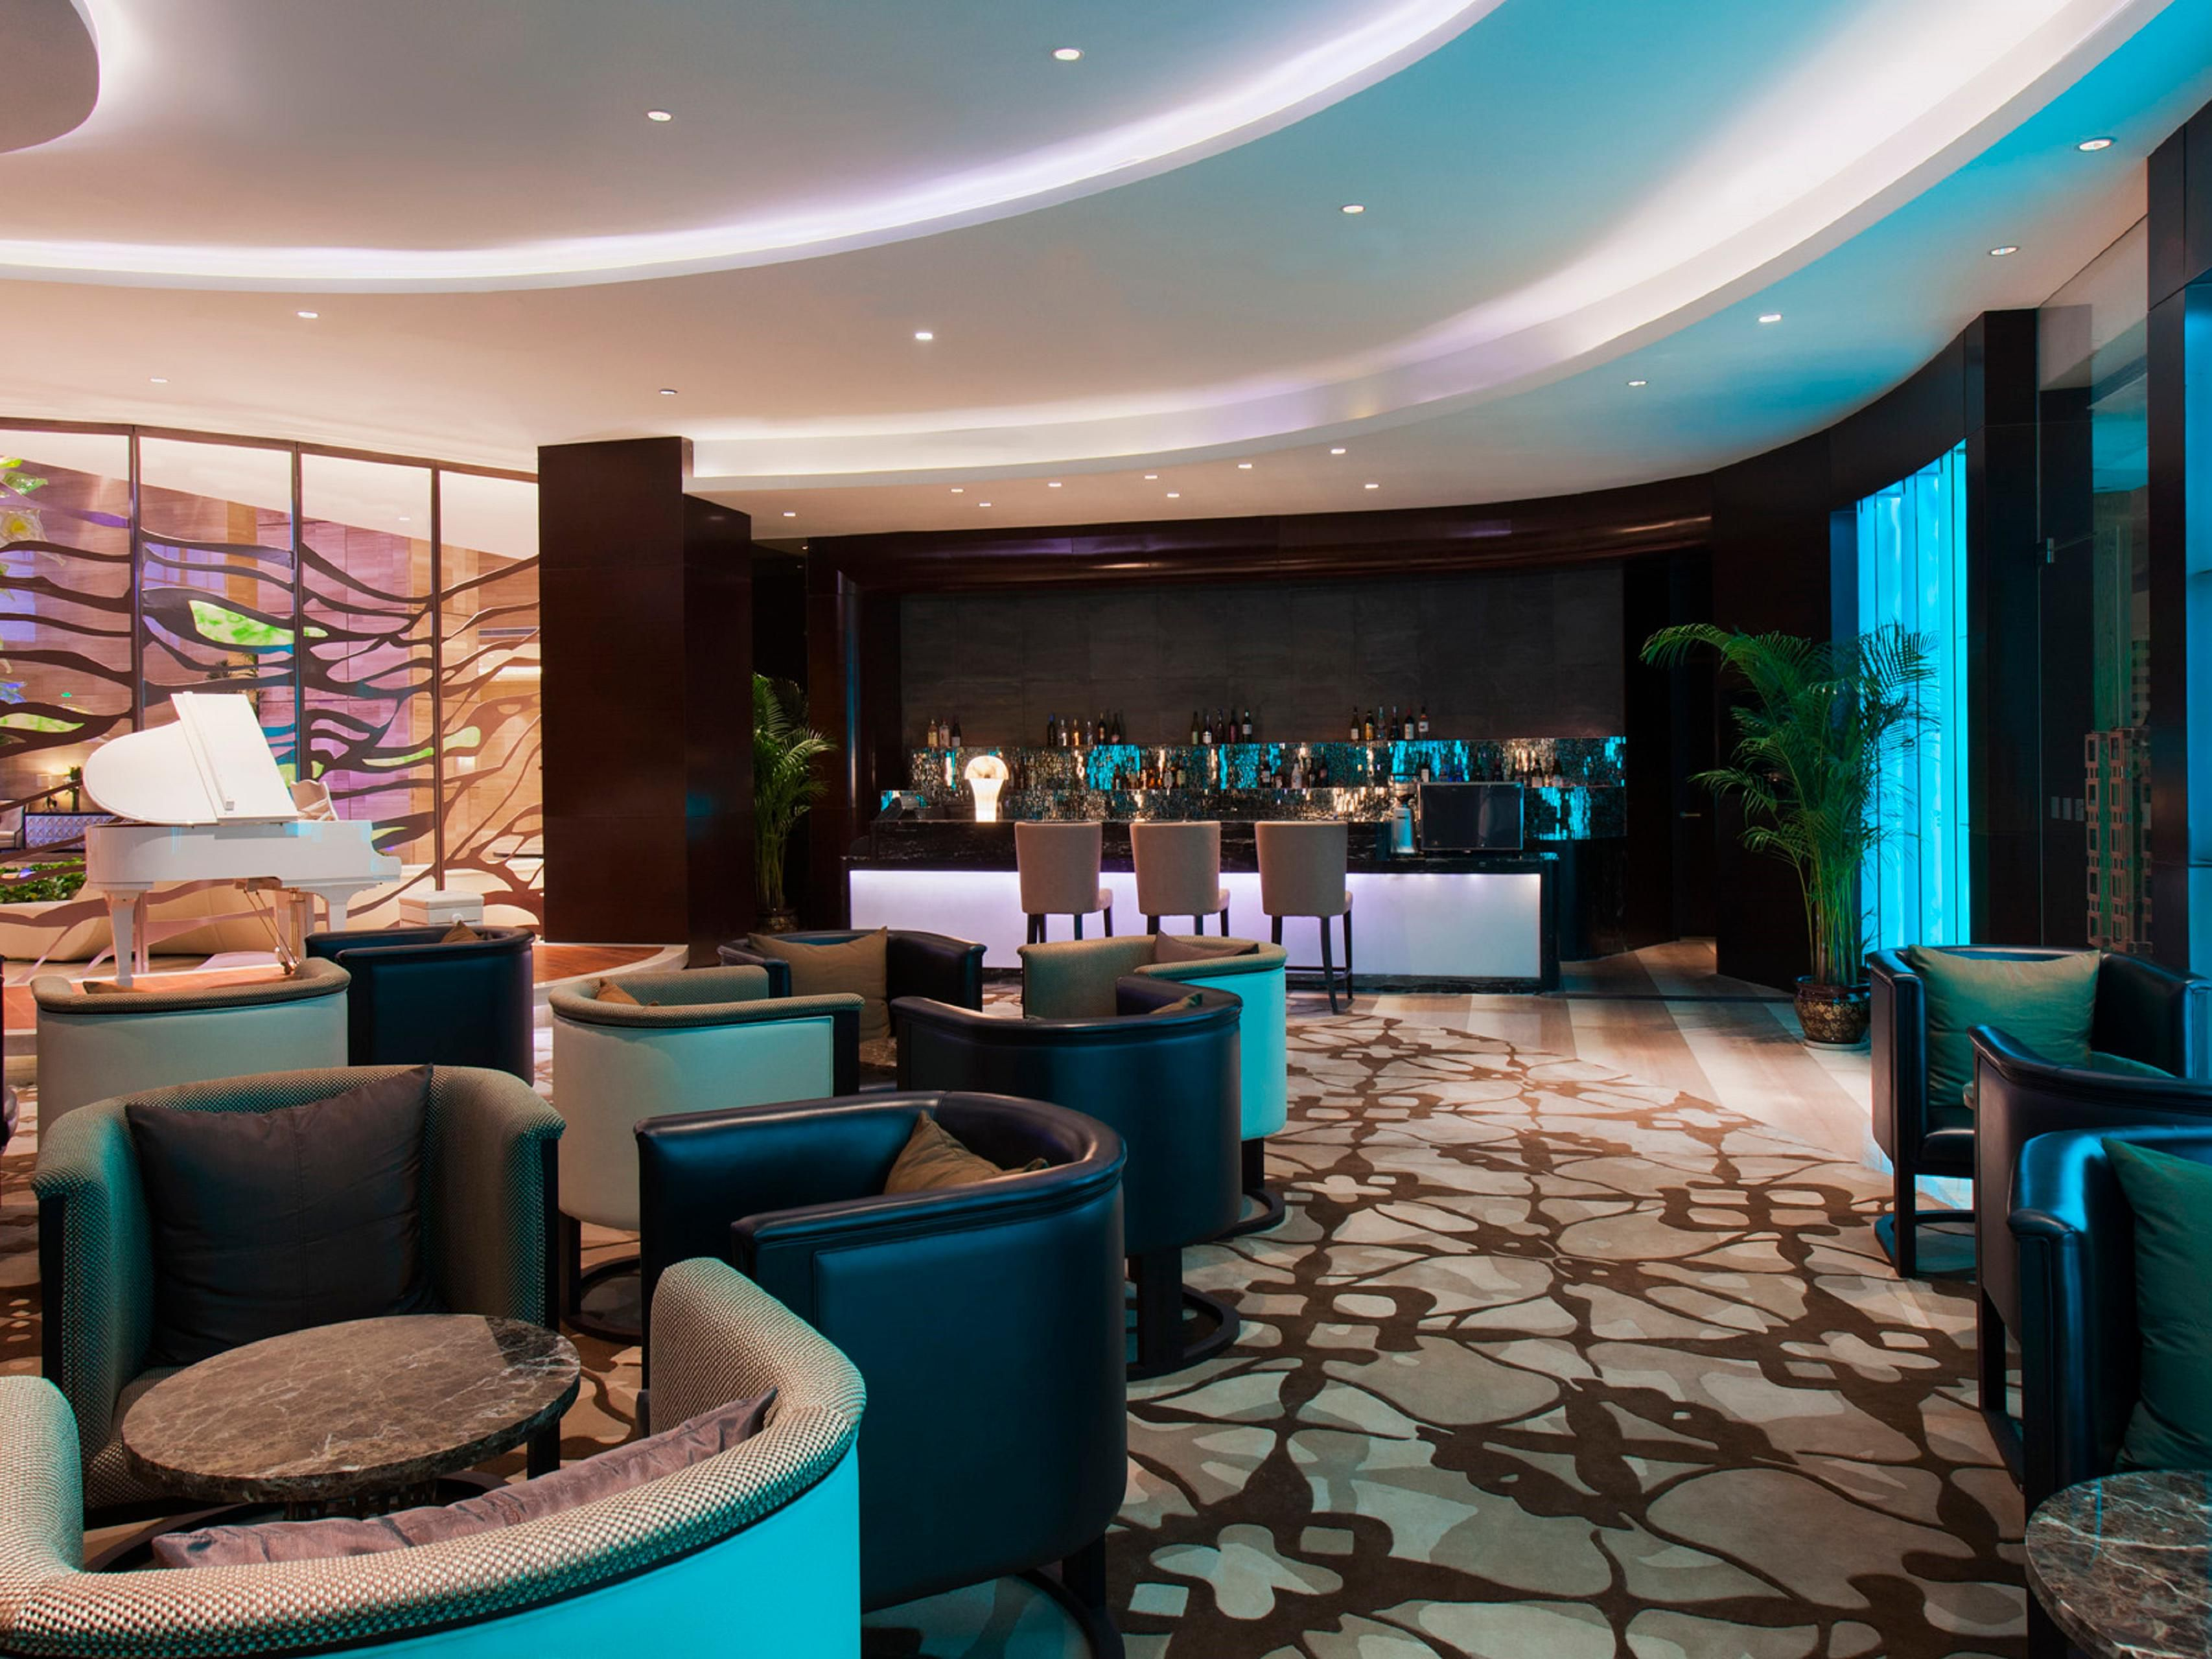 Holiday Inn Hotels Panjin Aqua City Panjin